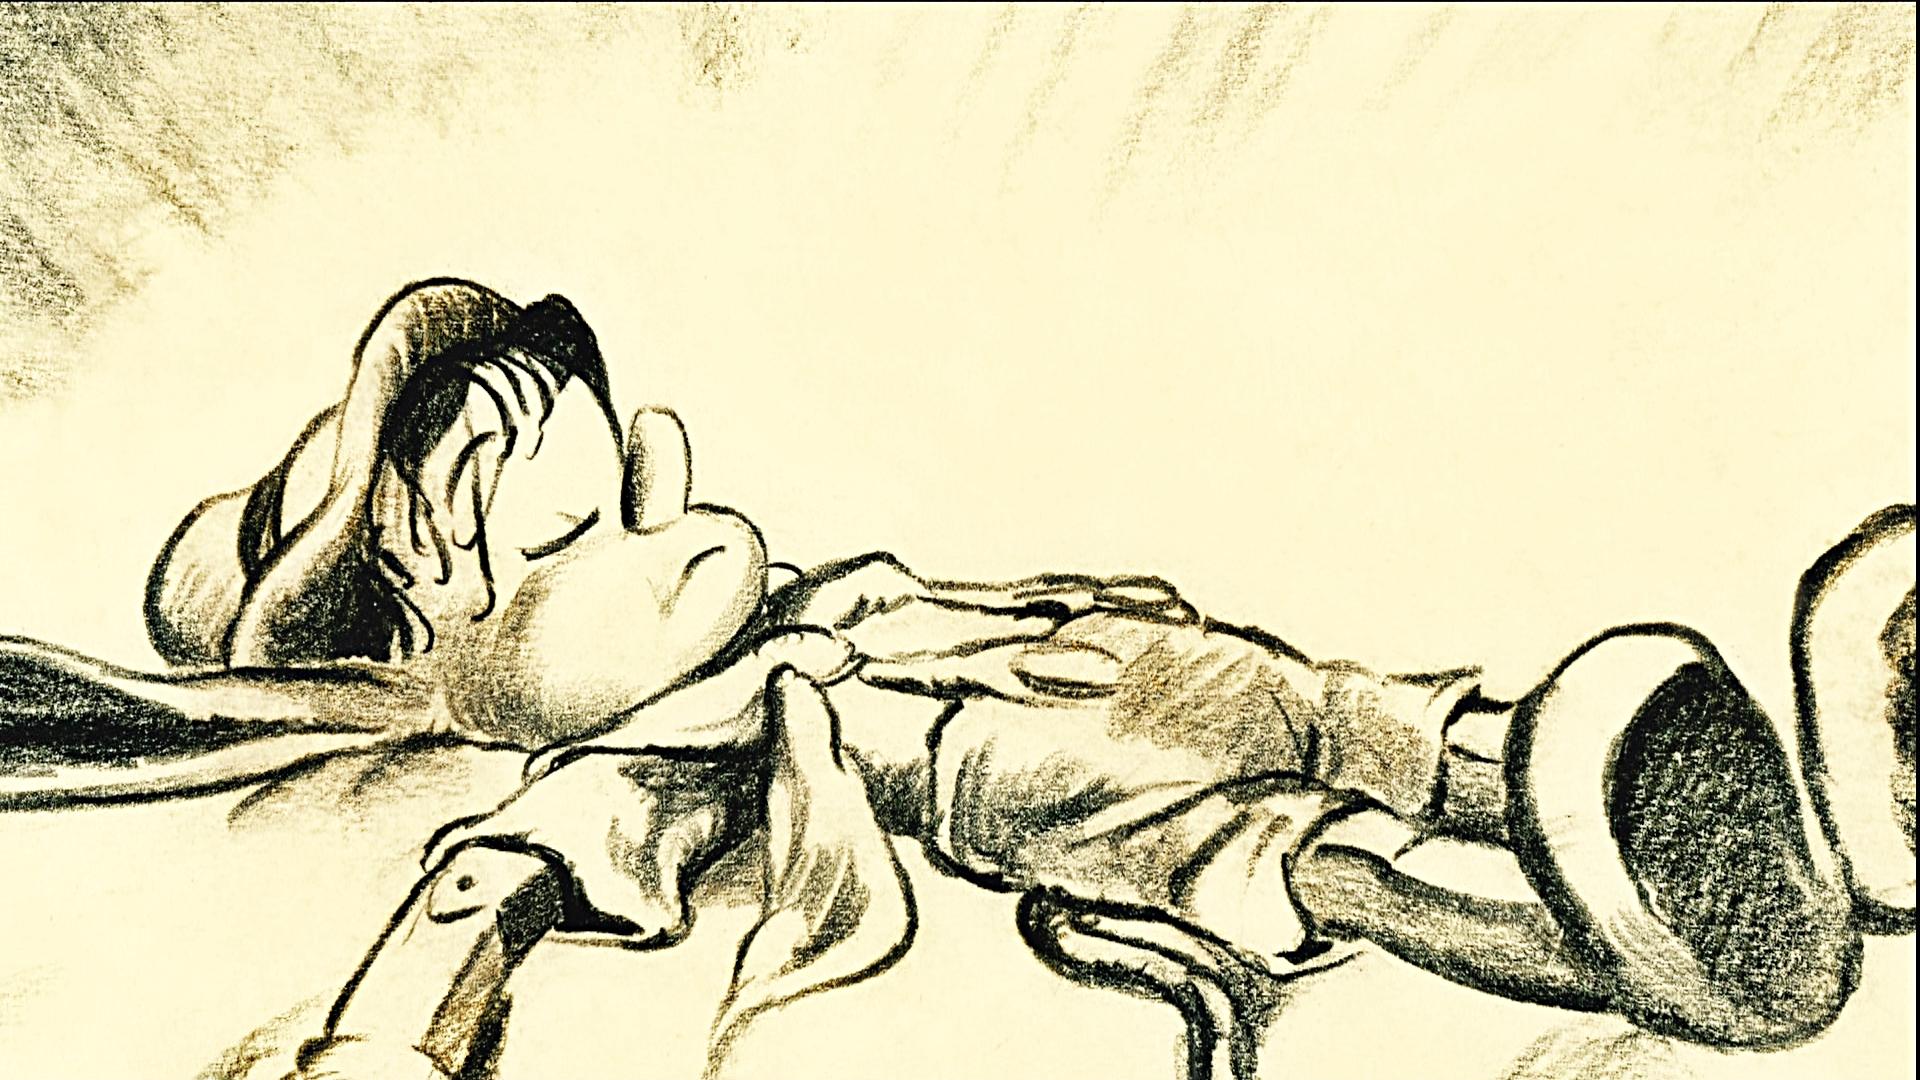 Walt Disney Sketches - Pinocchio